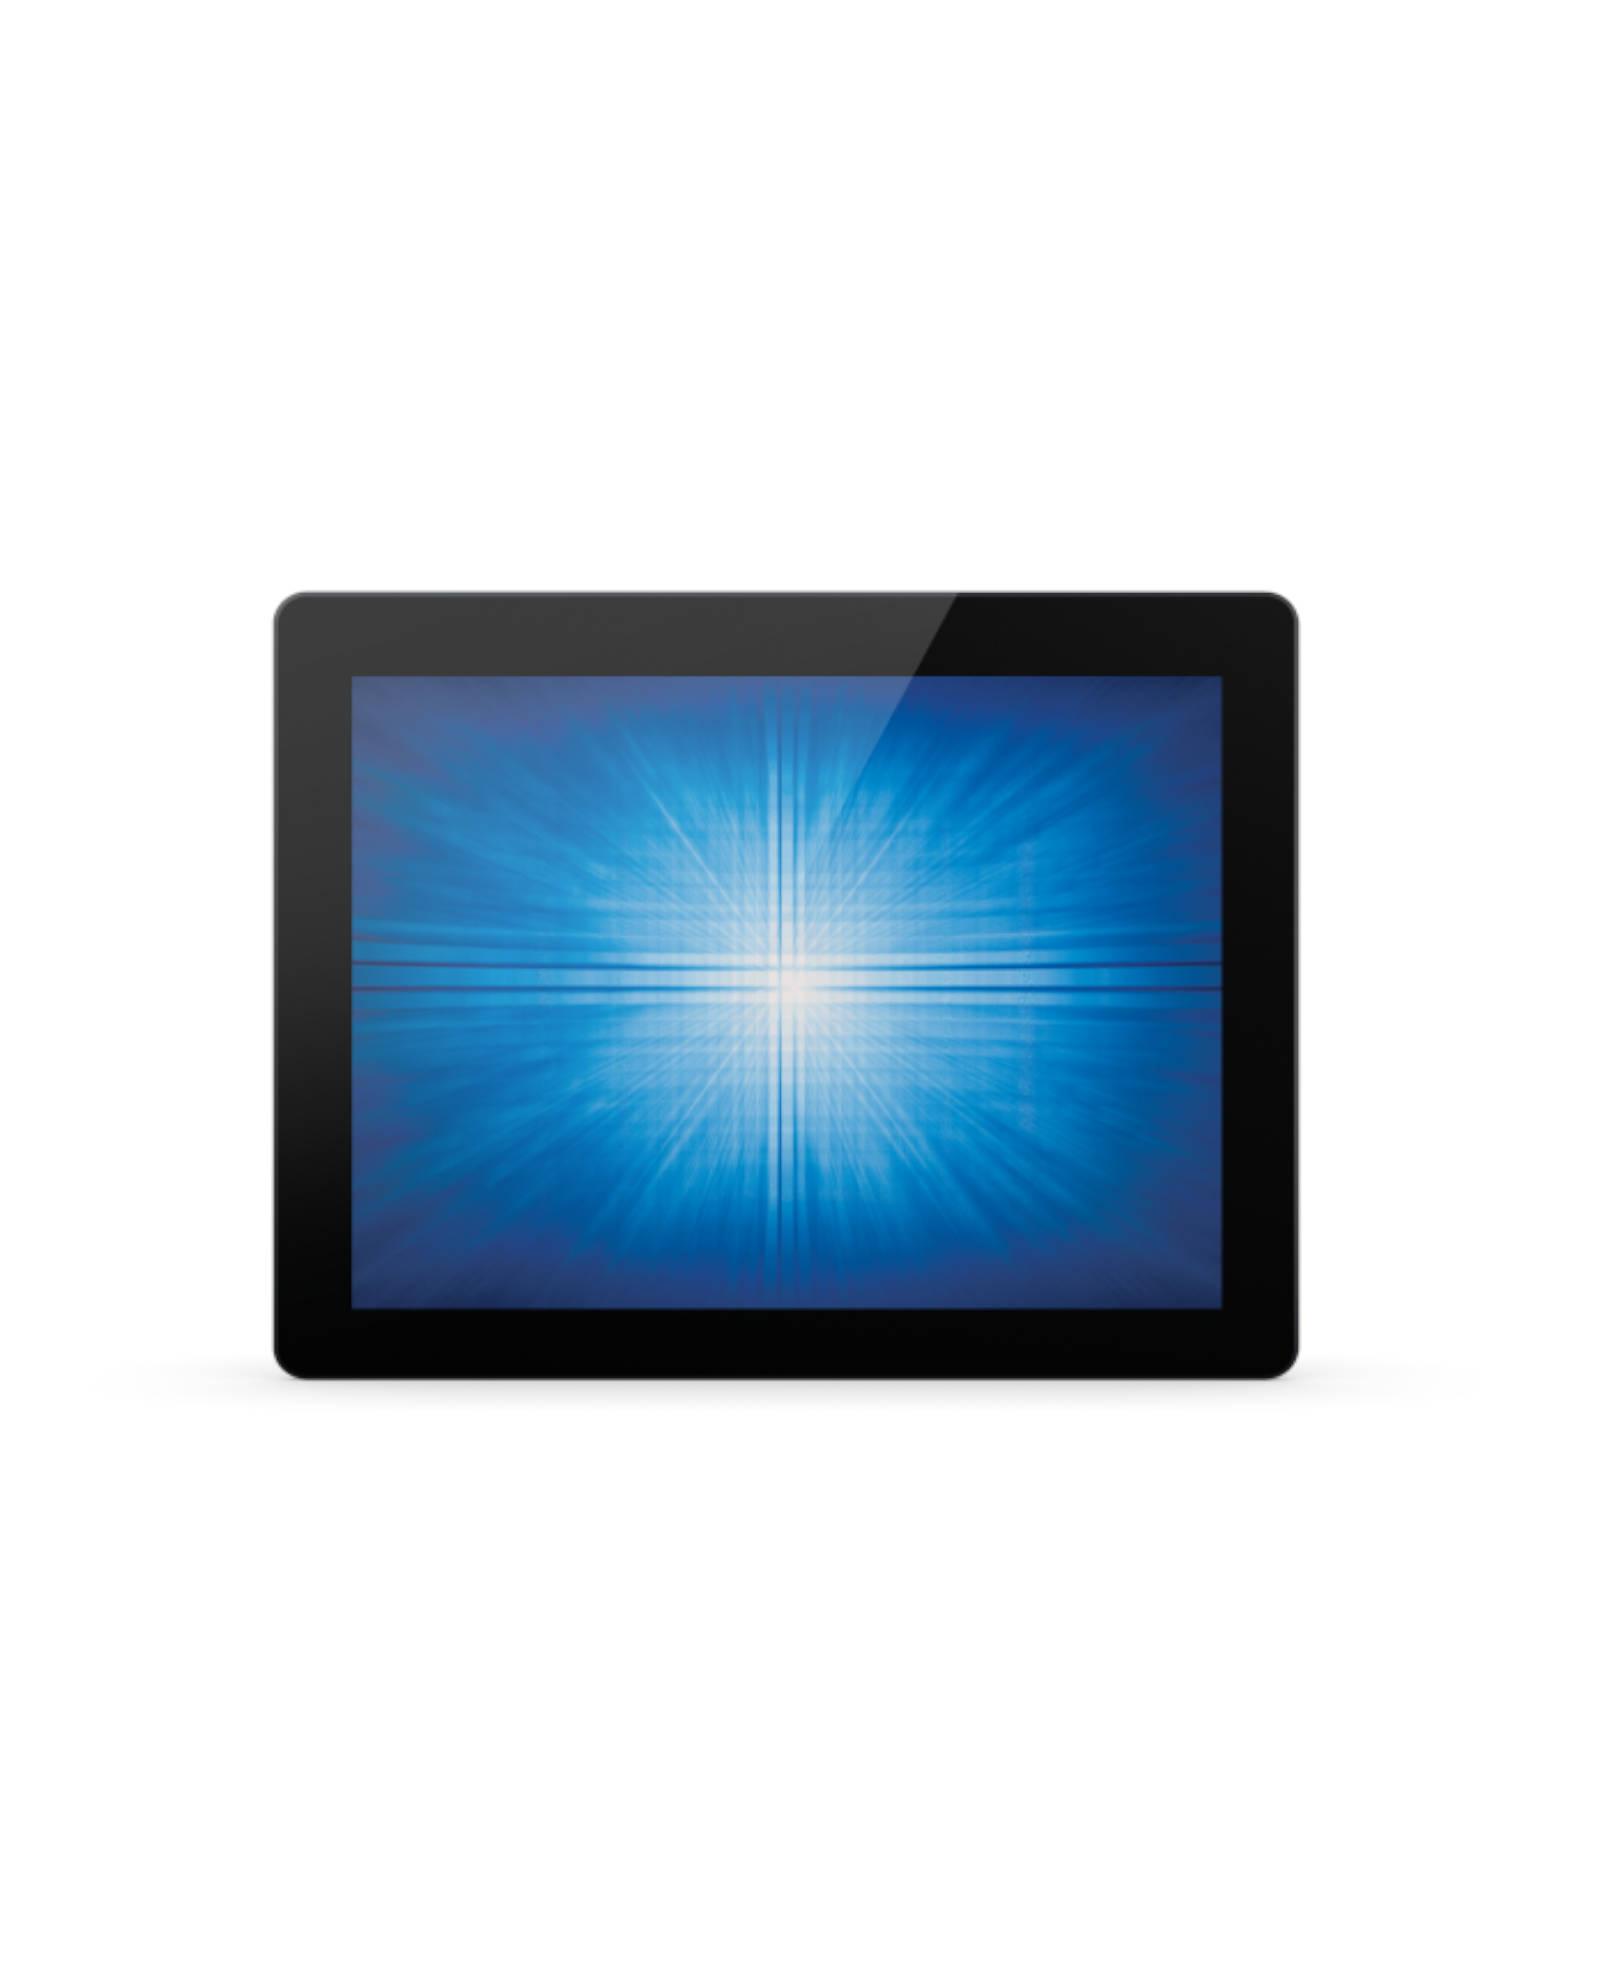 Elo 1590l 15 Open Frame Touchscreen34